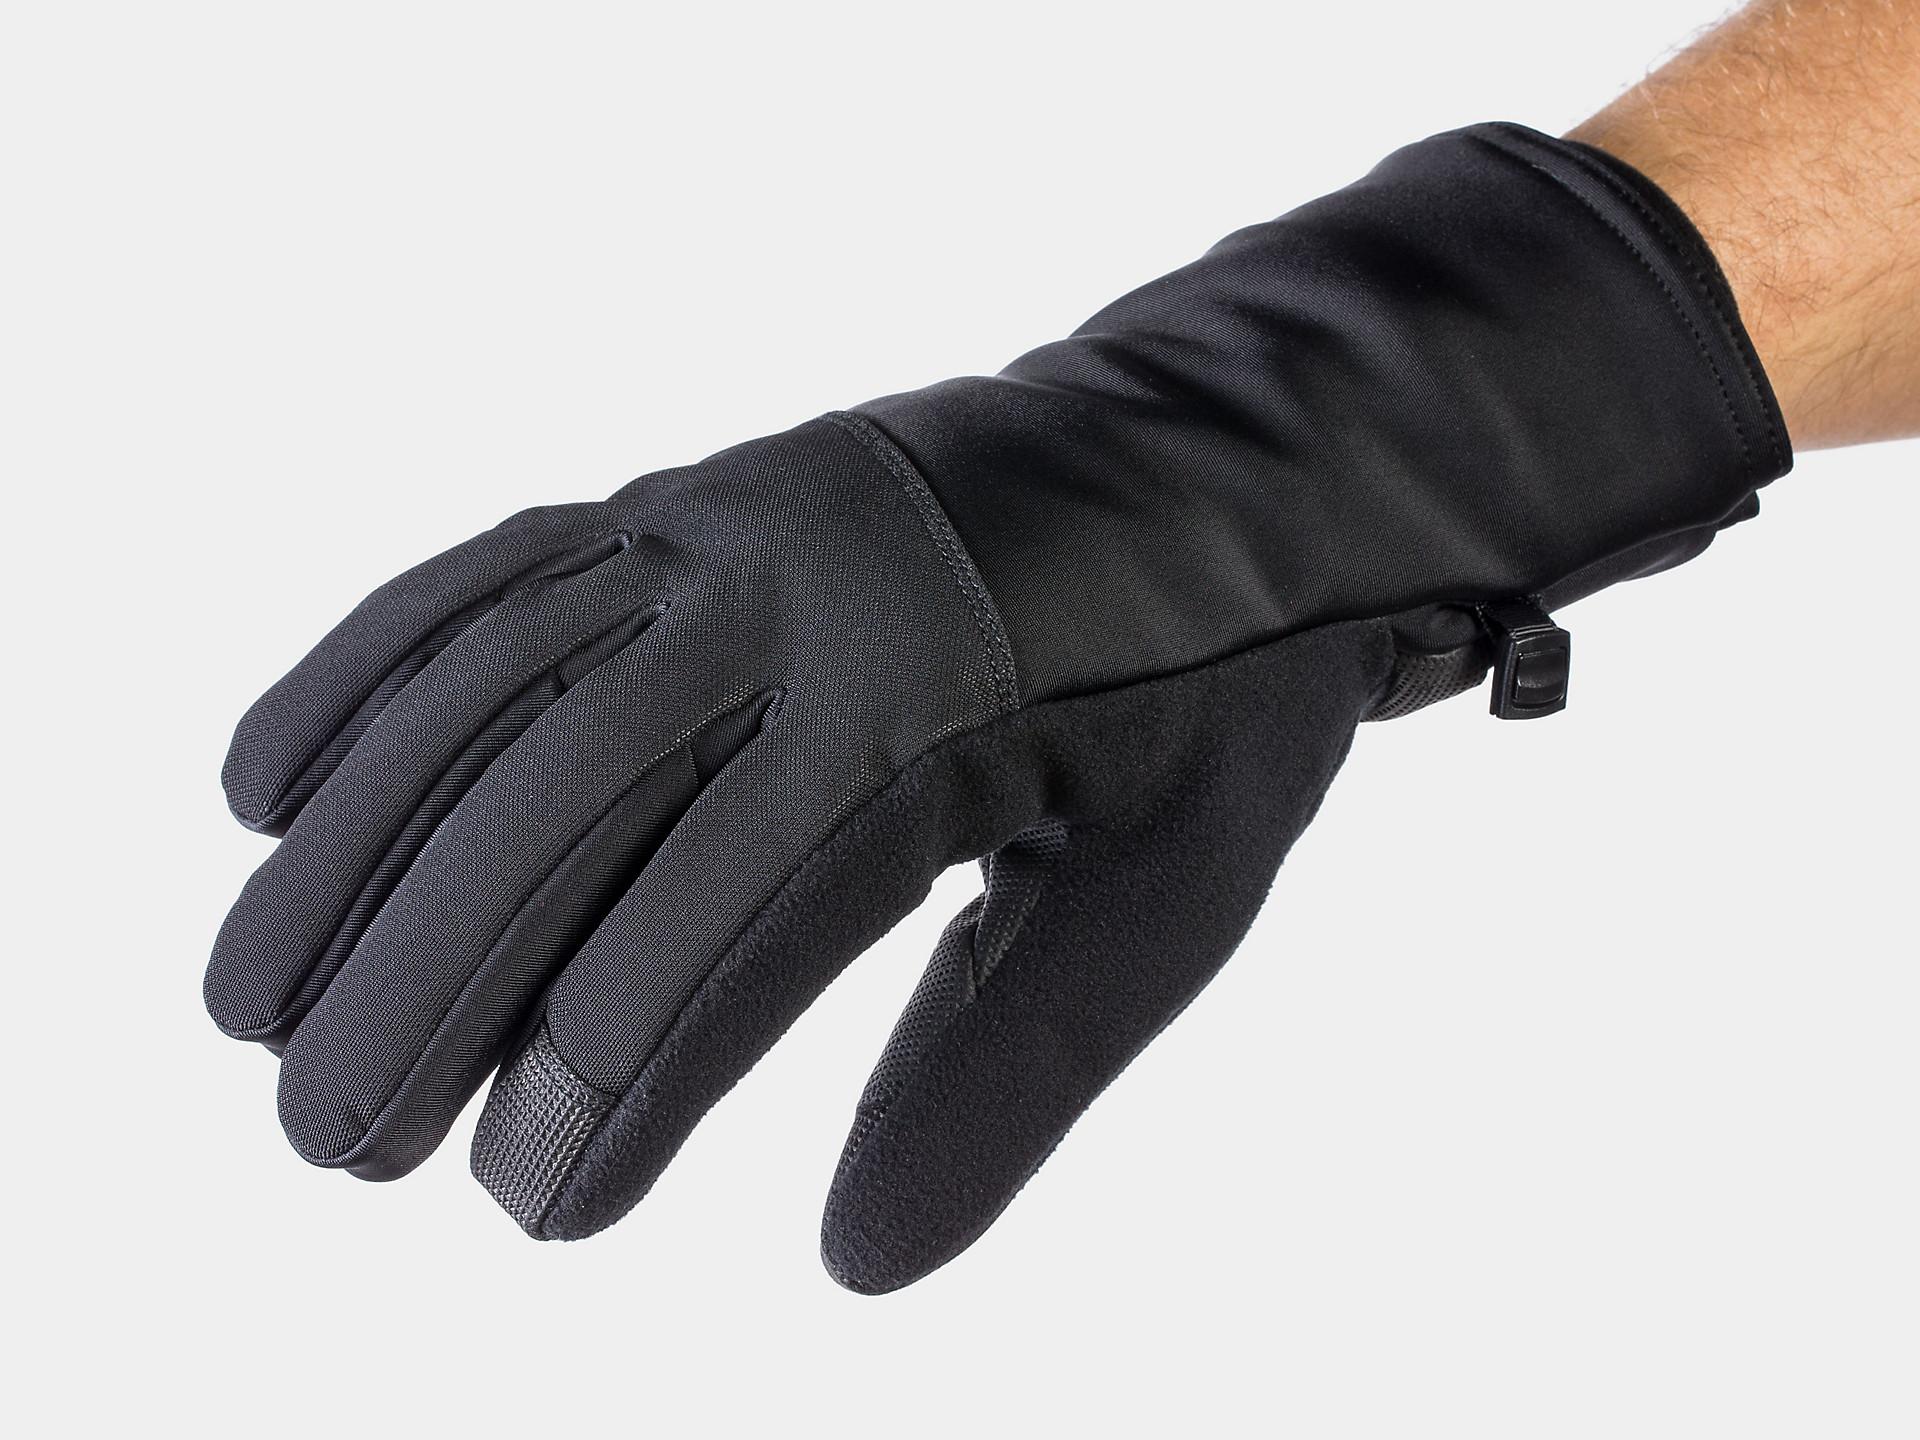 Men Cycling Gloves Bike Full Finger Bicycle Gel Padded Fingerless Sports 4 color